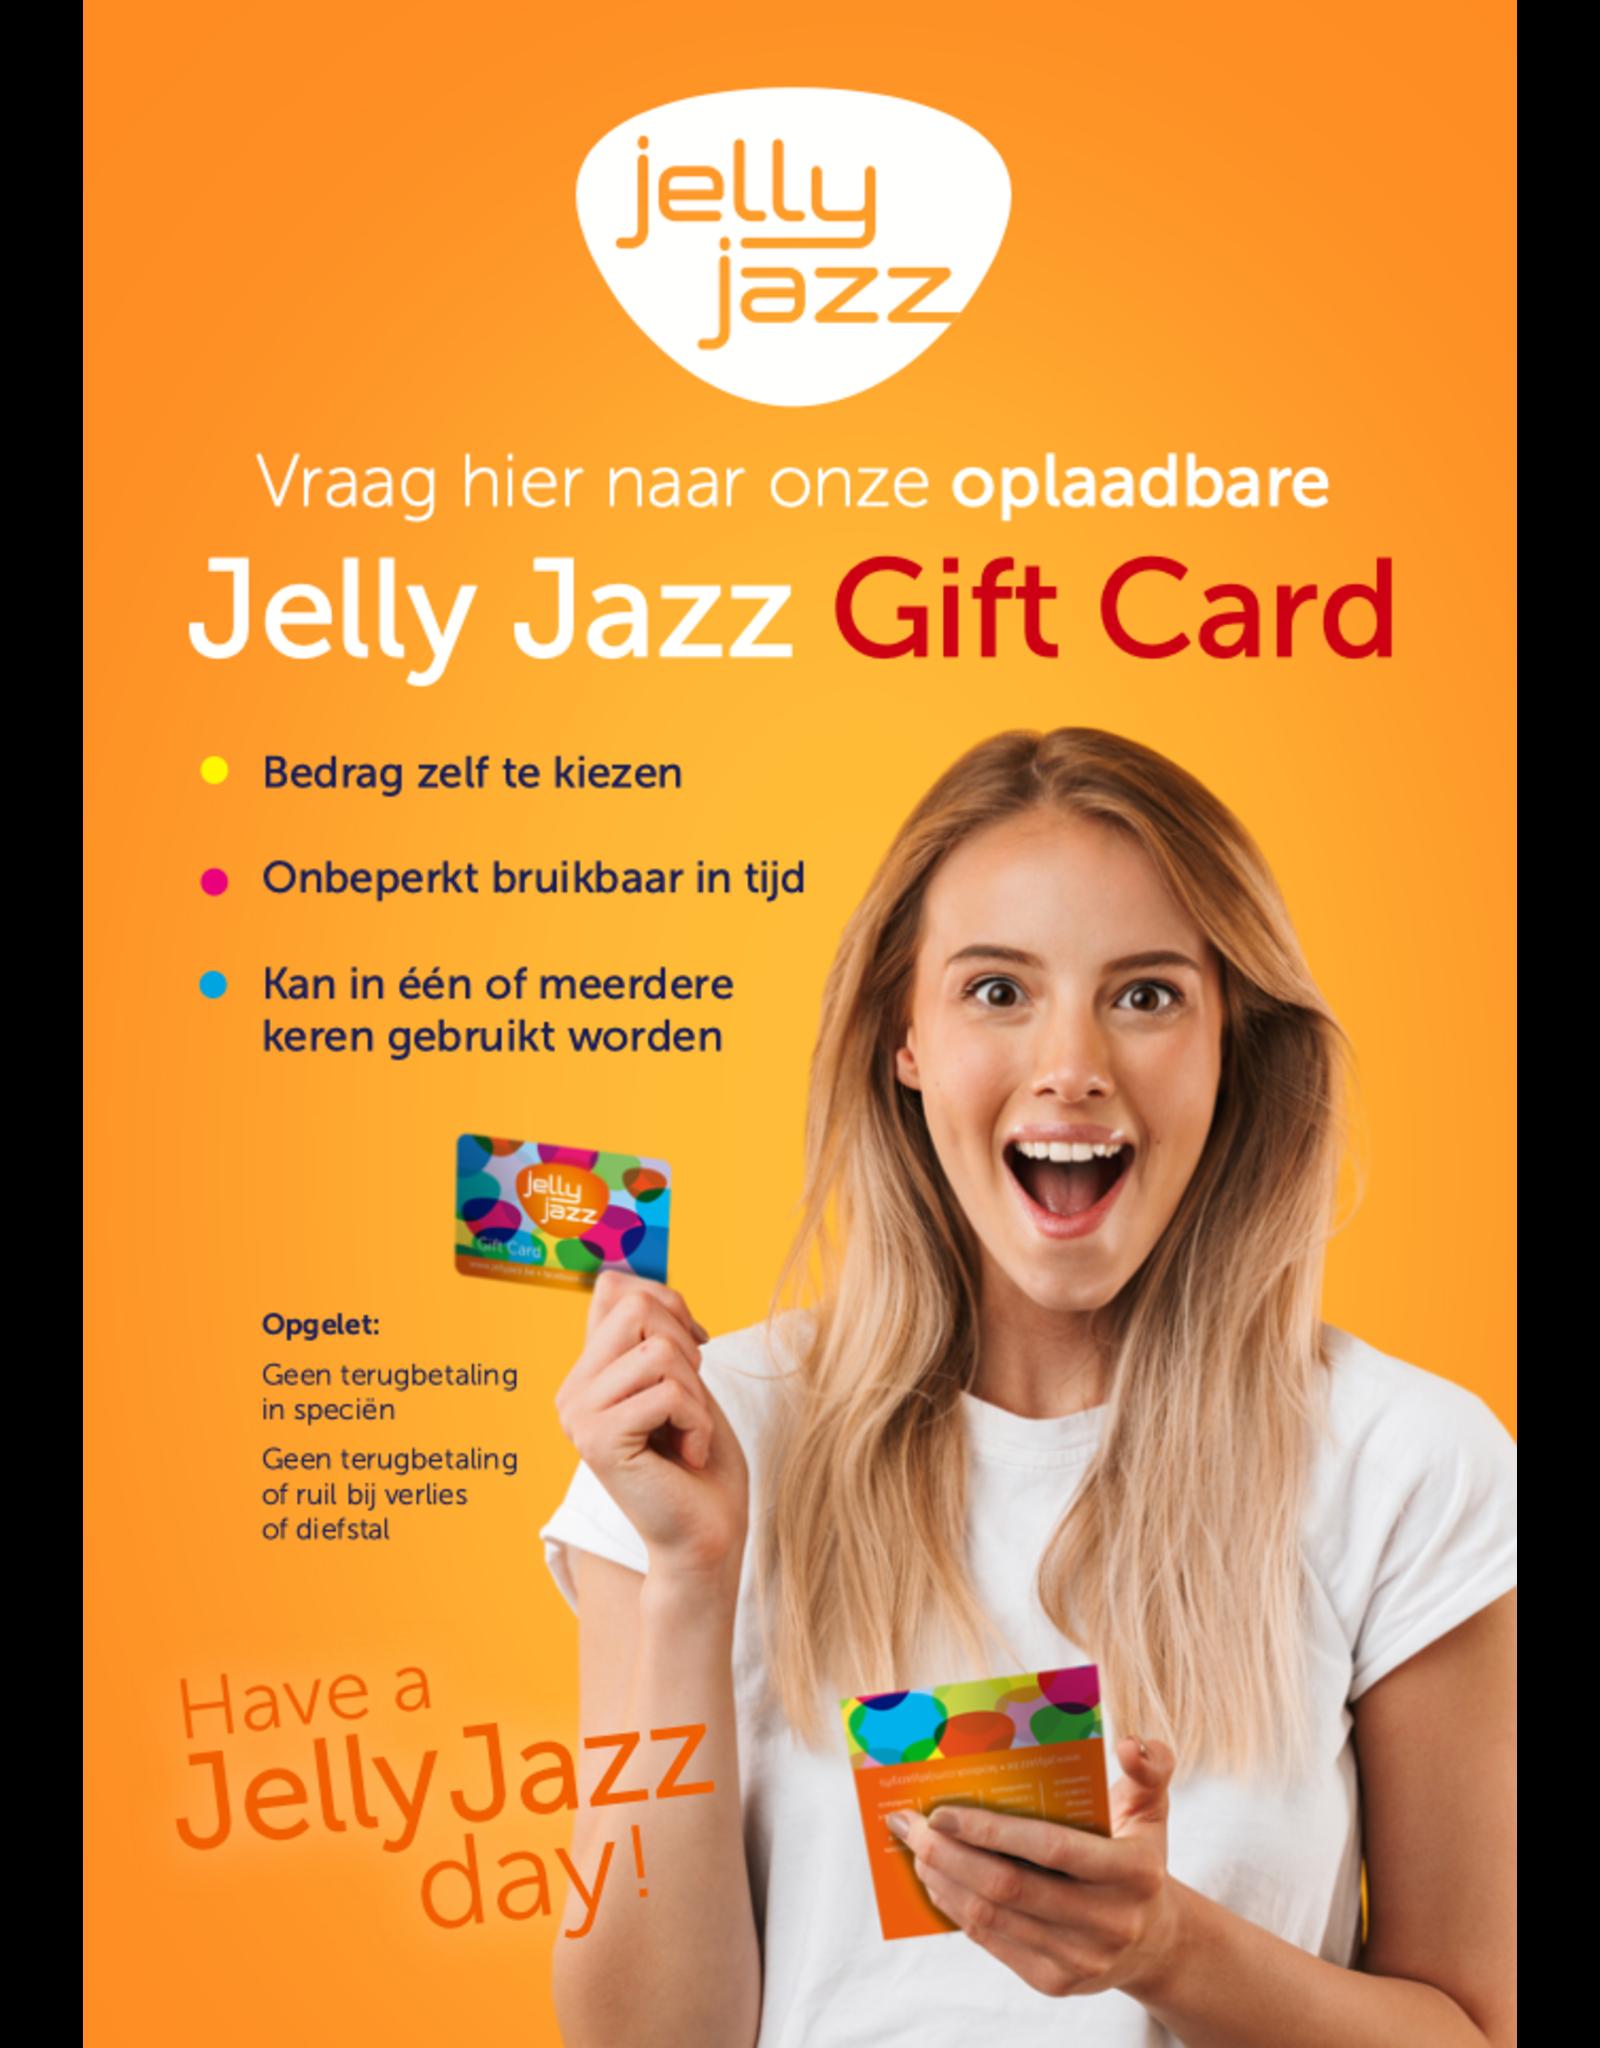 Jelly Jazz gift card € 100